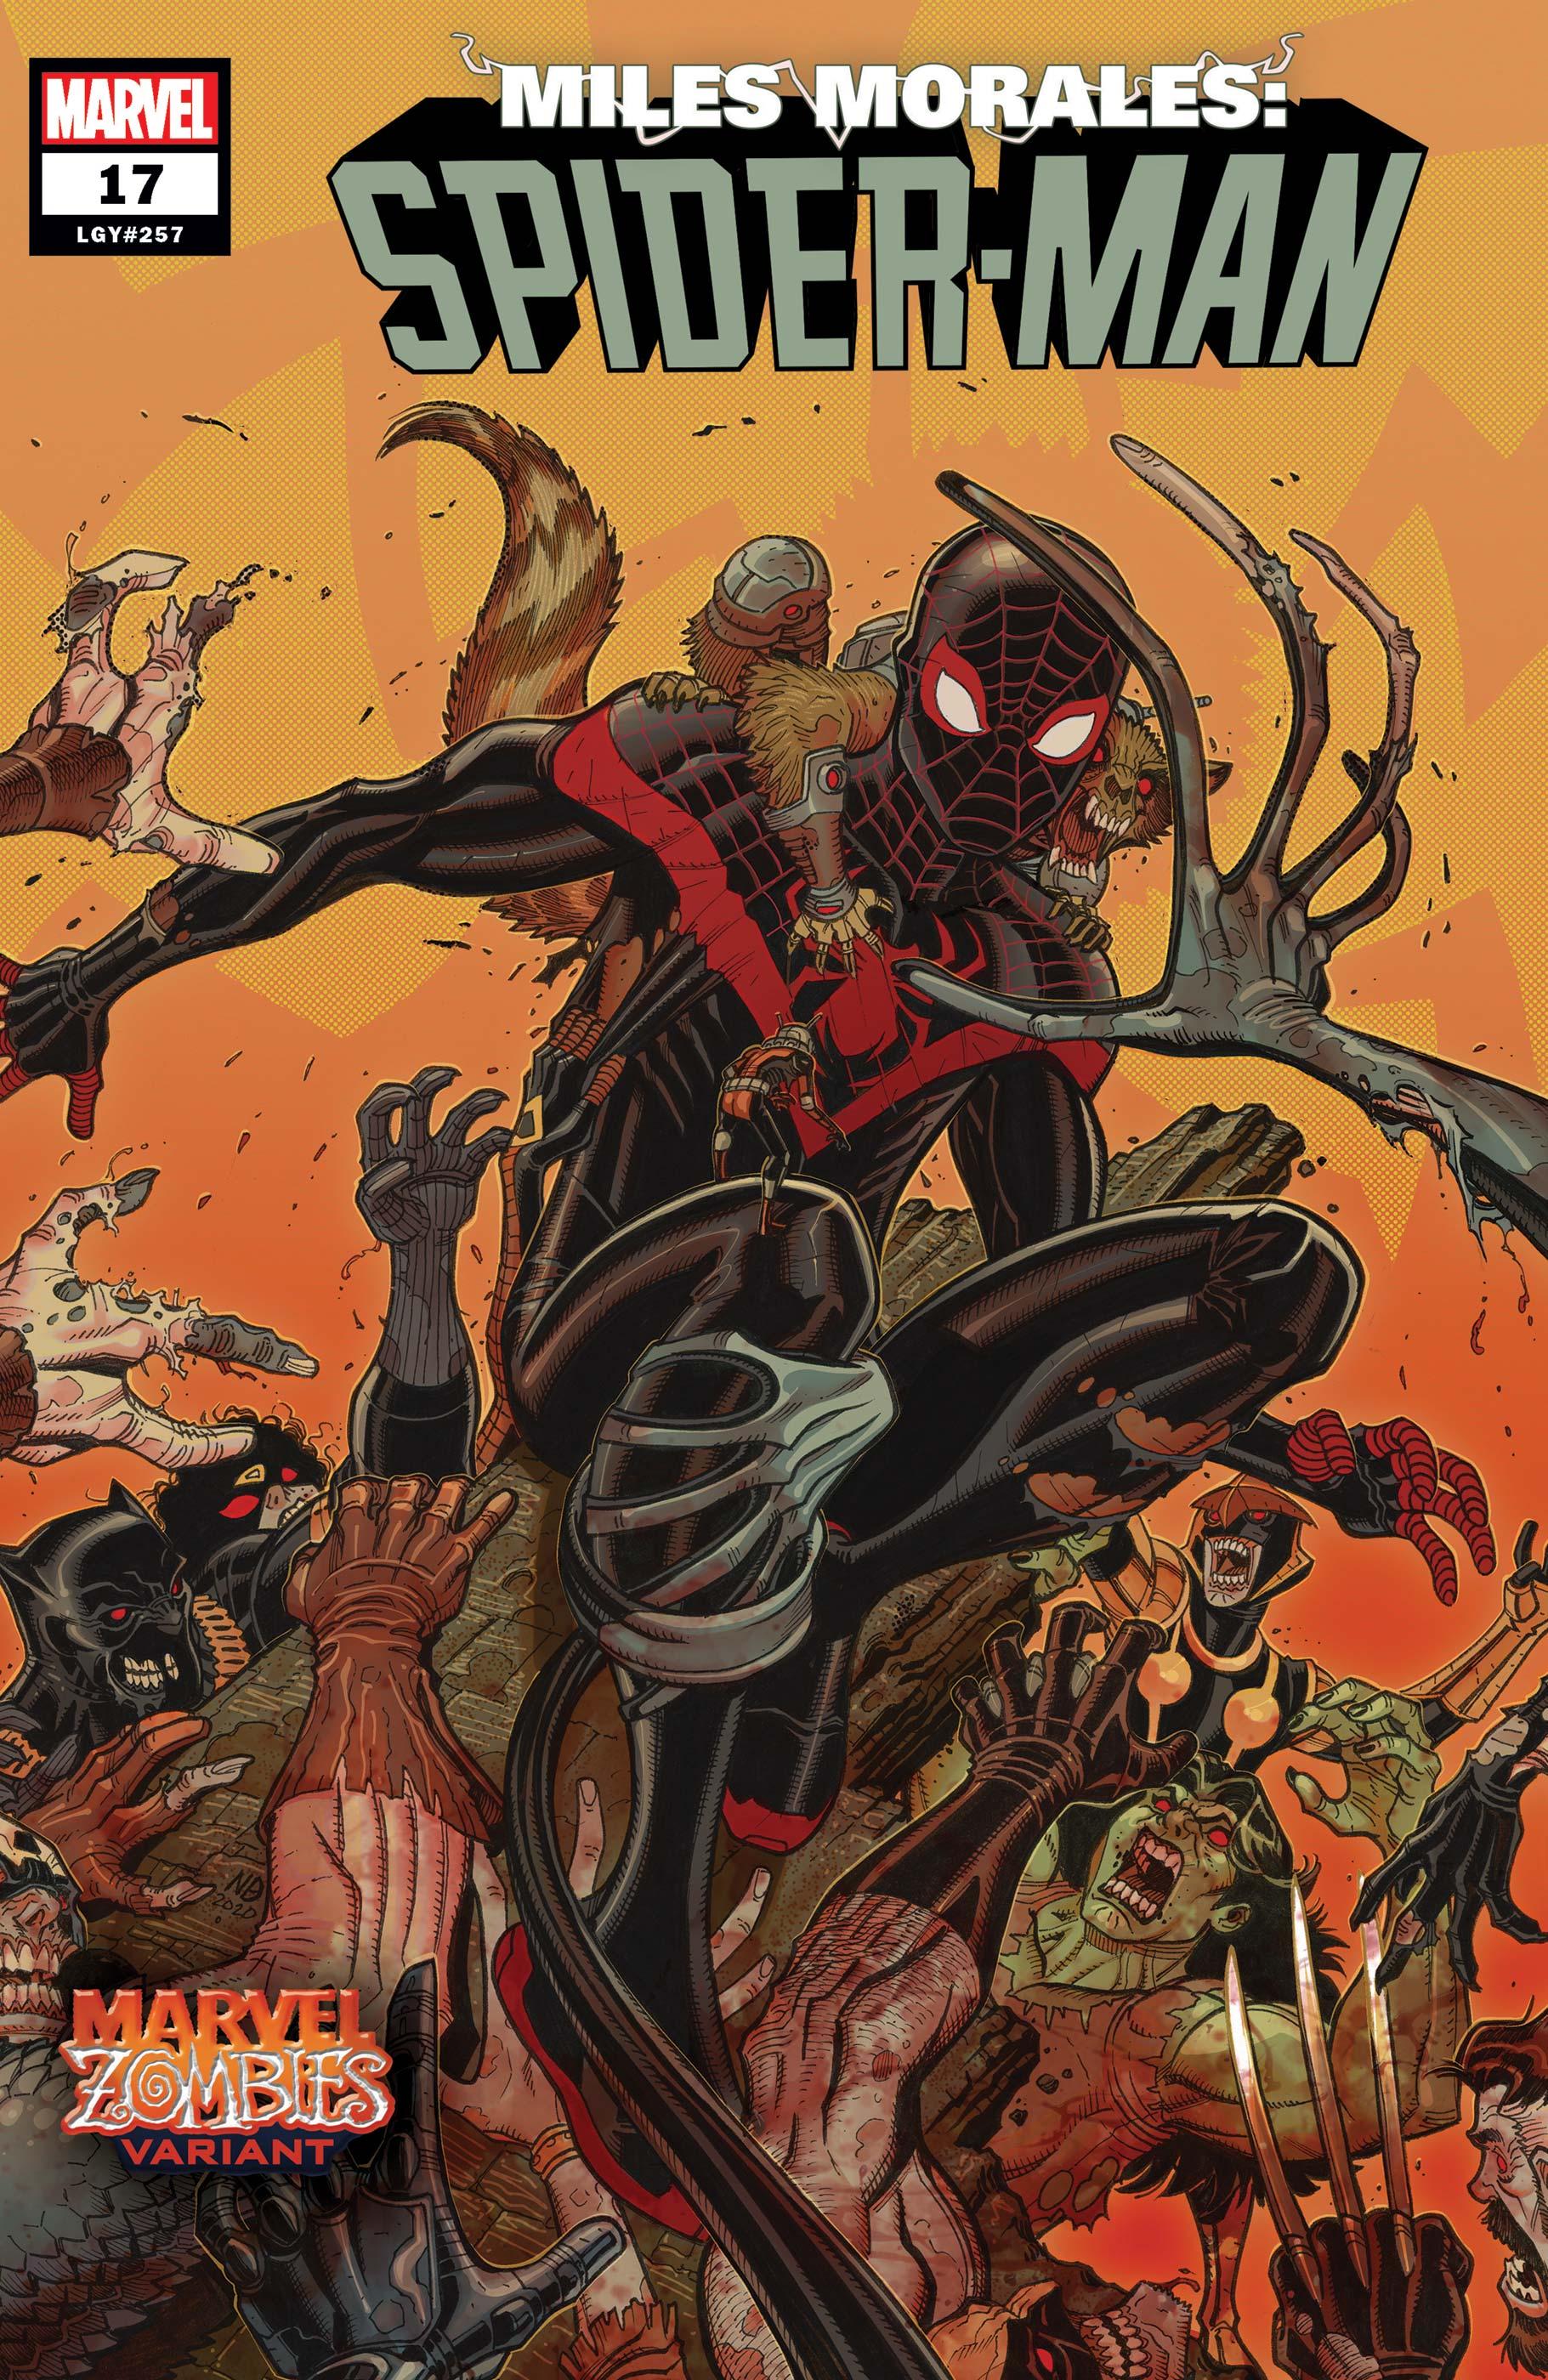 Miles Morales: Spider-Man (2018) #17 (Variant)